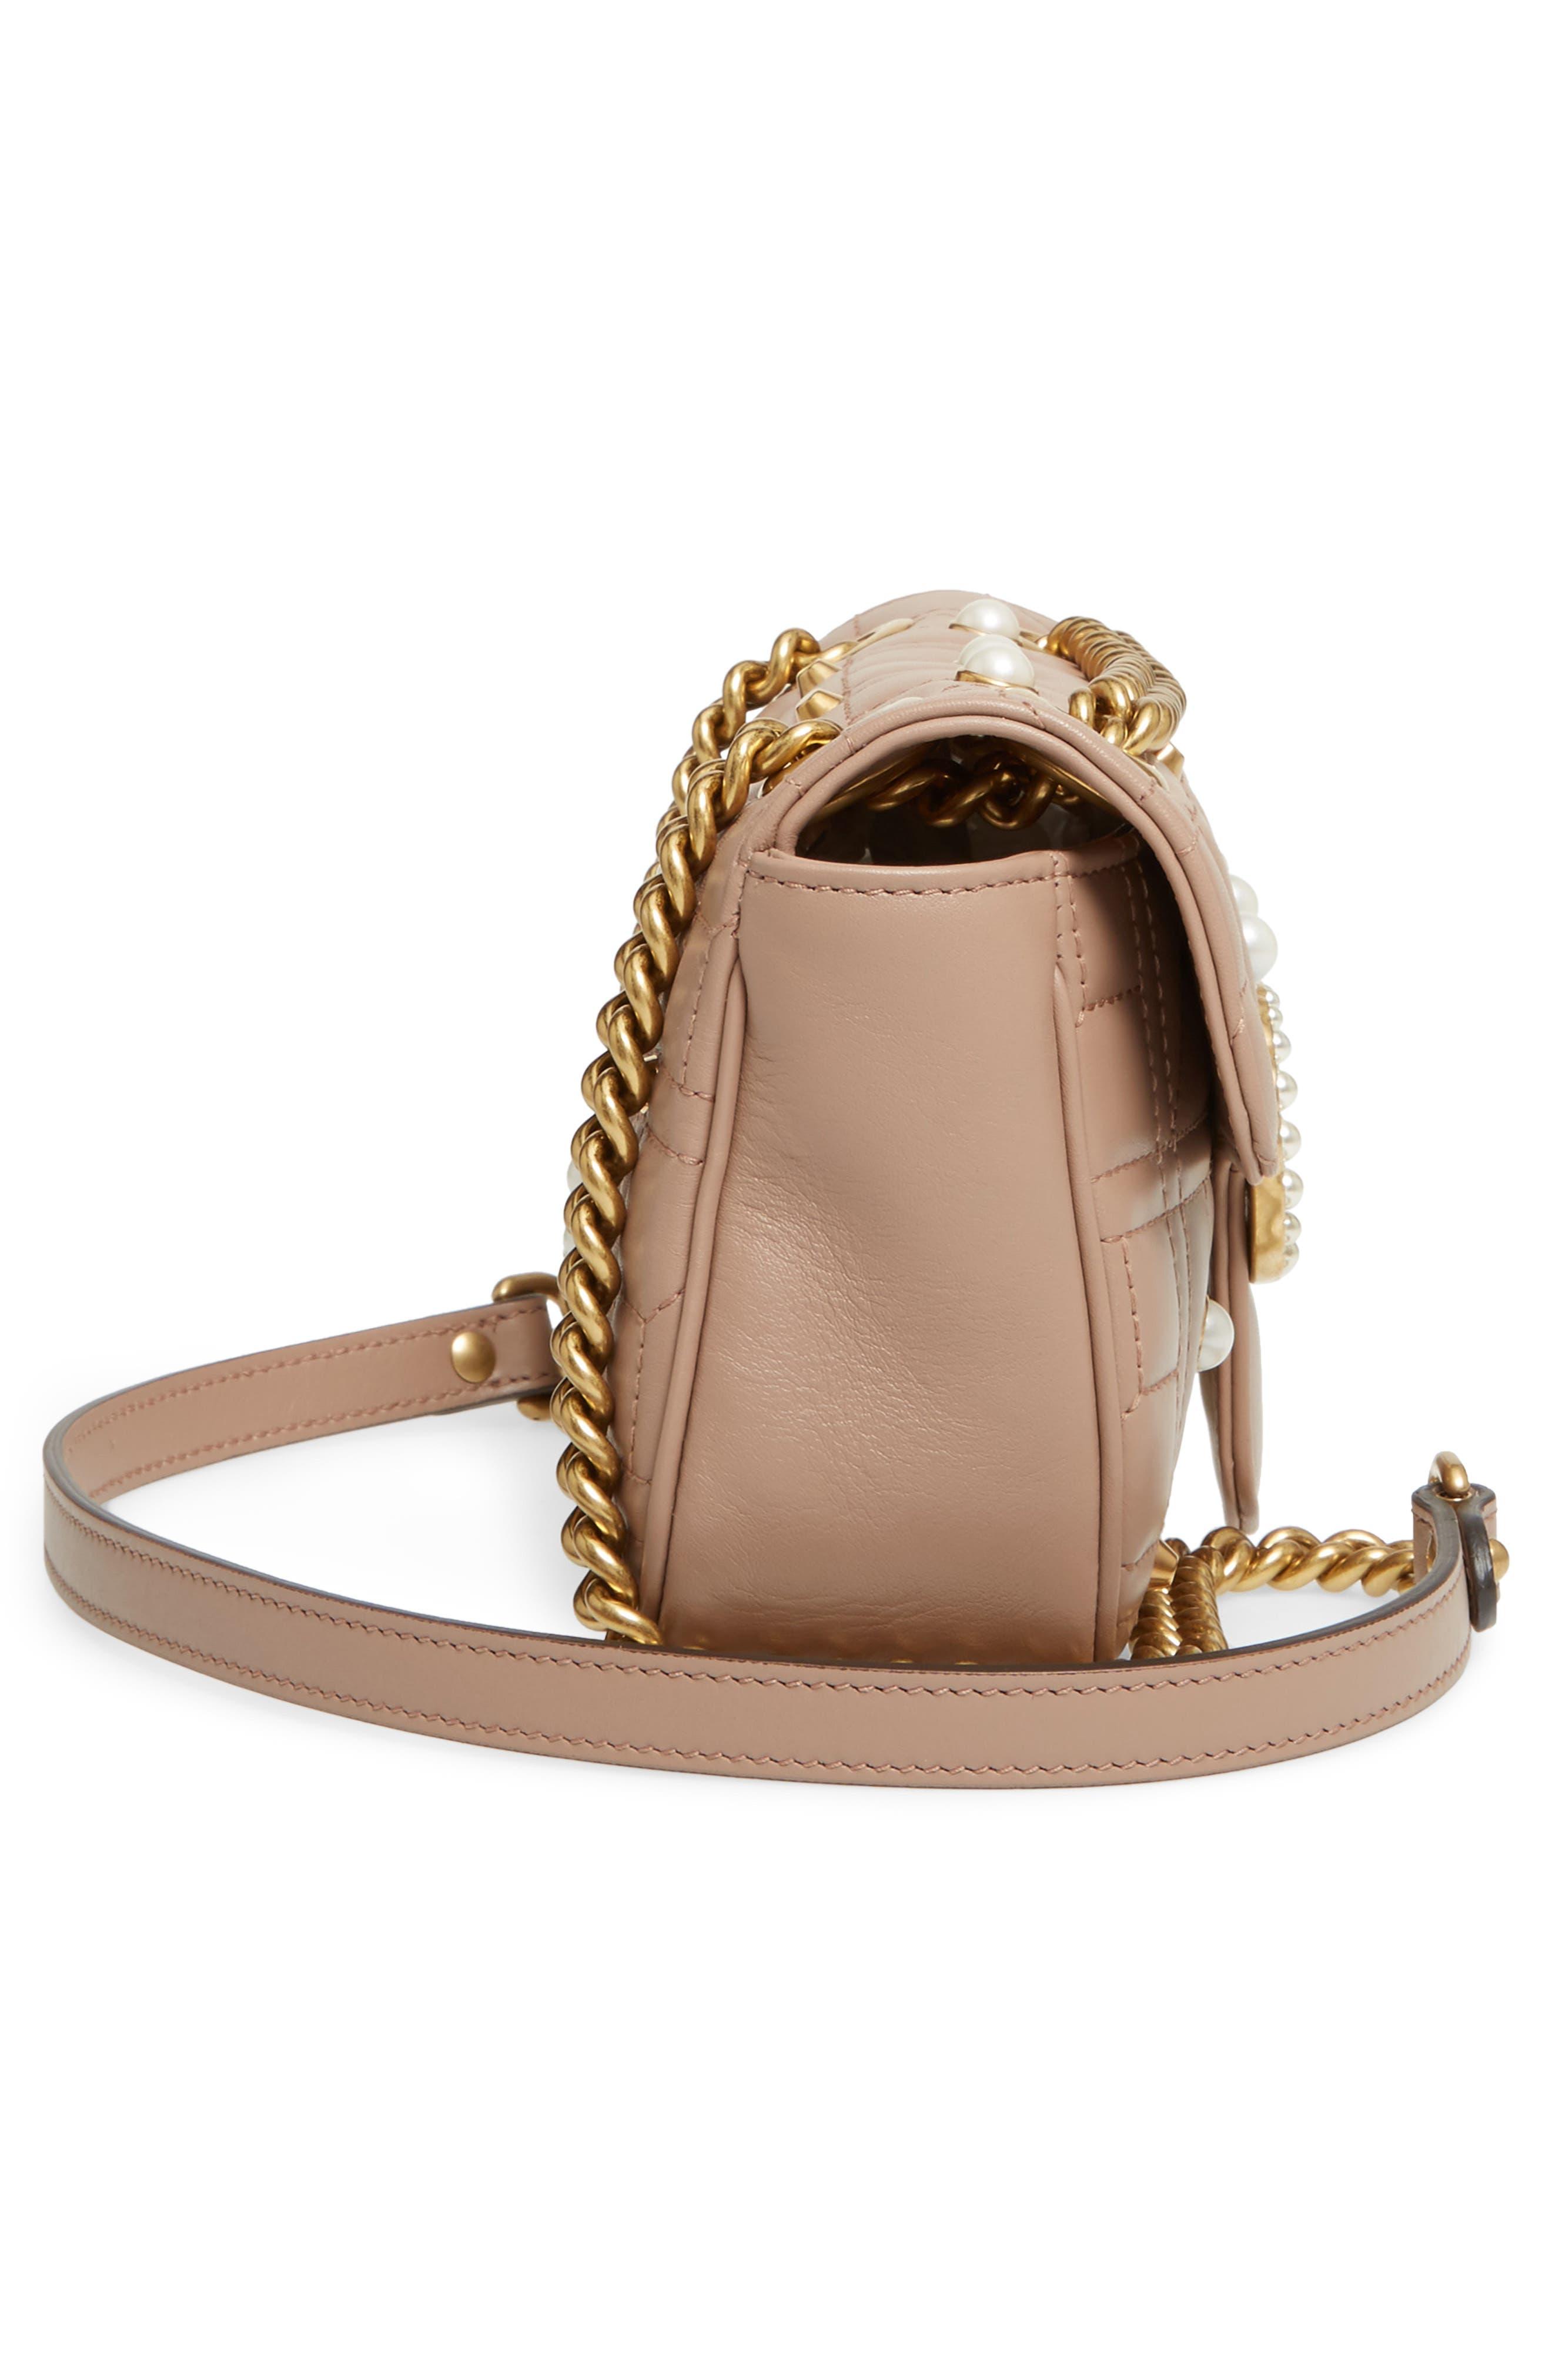 GUCCI, Mini GG Marmont 2.0 Imitation Pearl Logo Matelassé Leather Shoulder Bag, Alternate thumbnail 5, color, 651